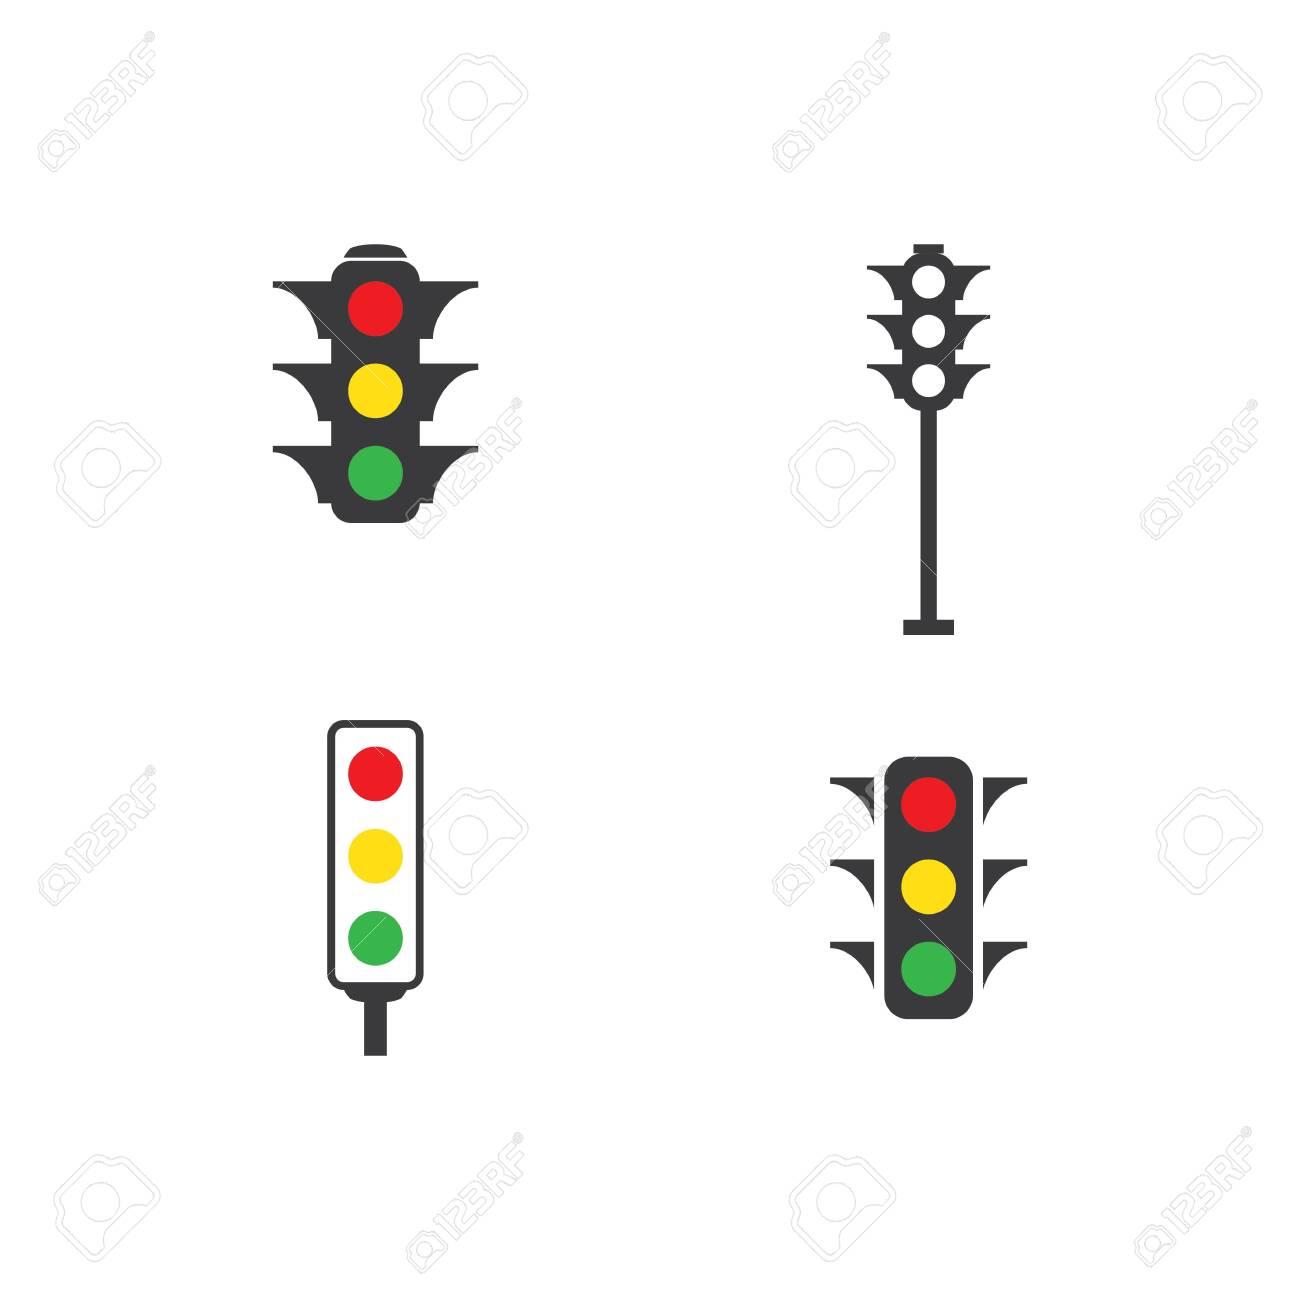 Traffic lights icon vector design - 154100894